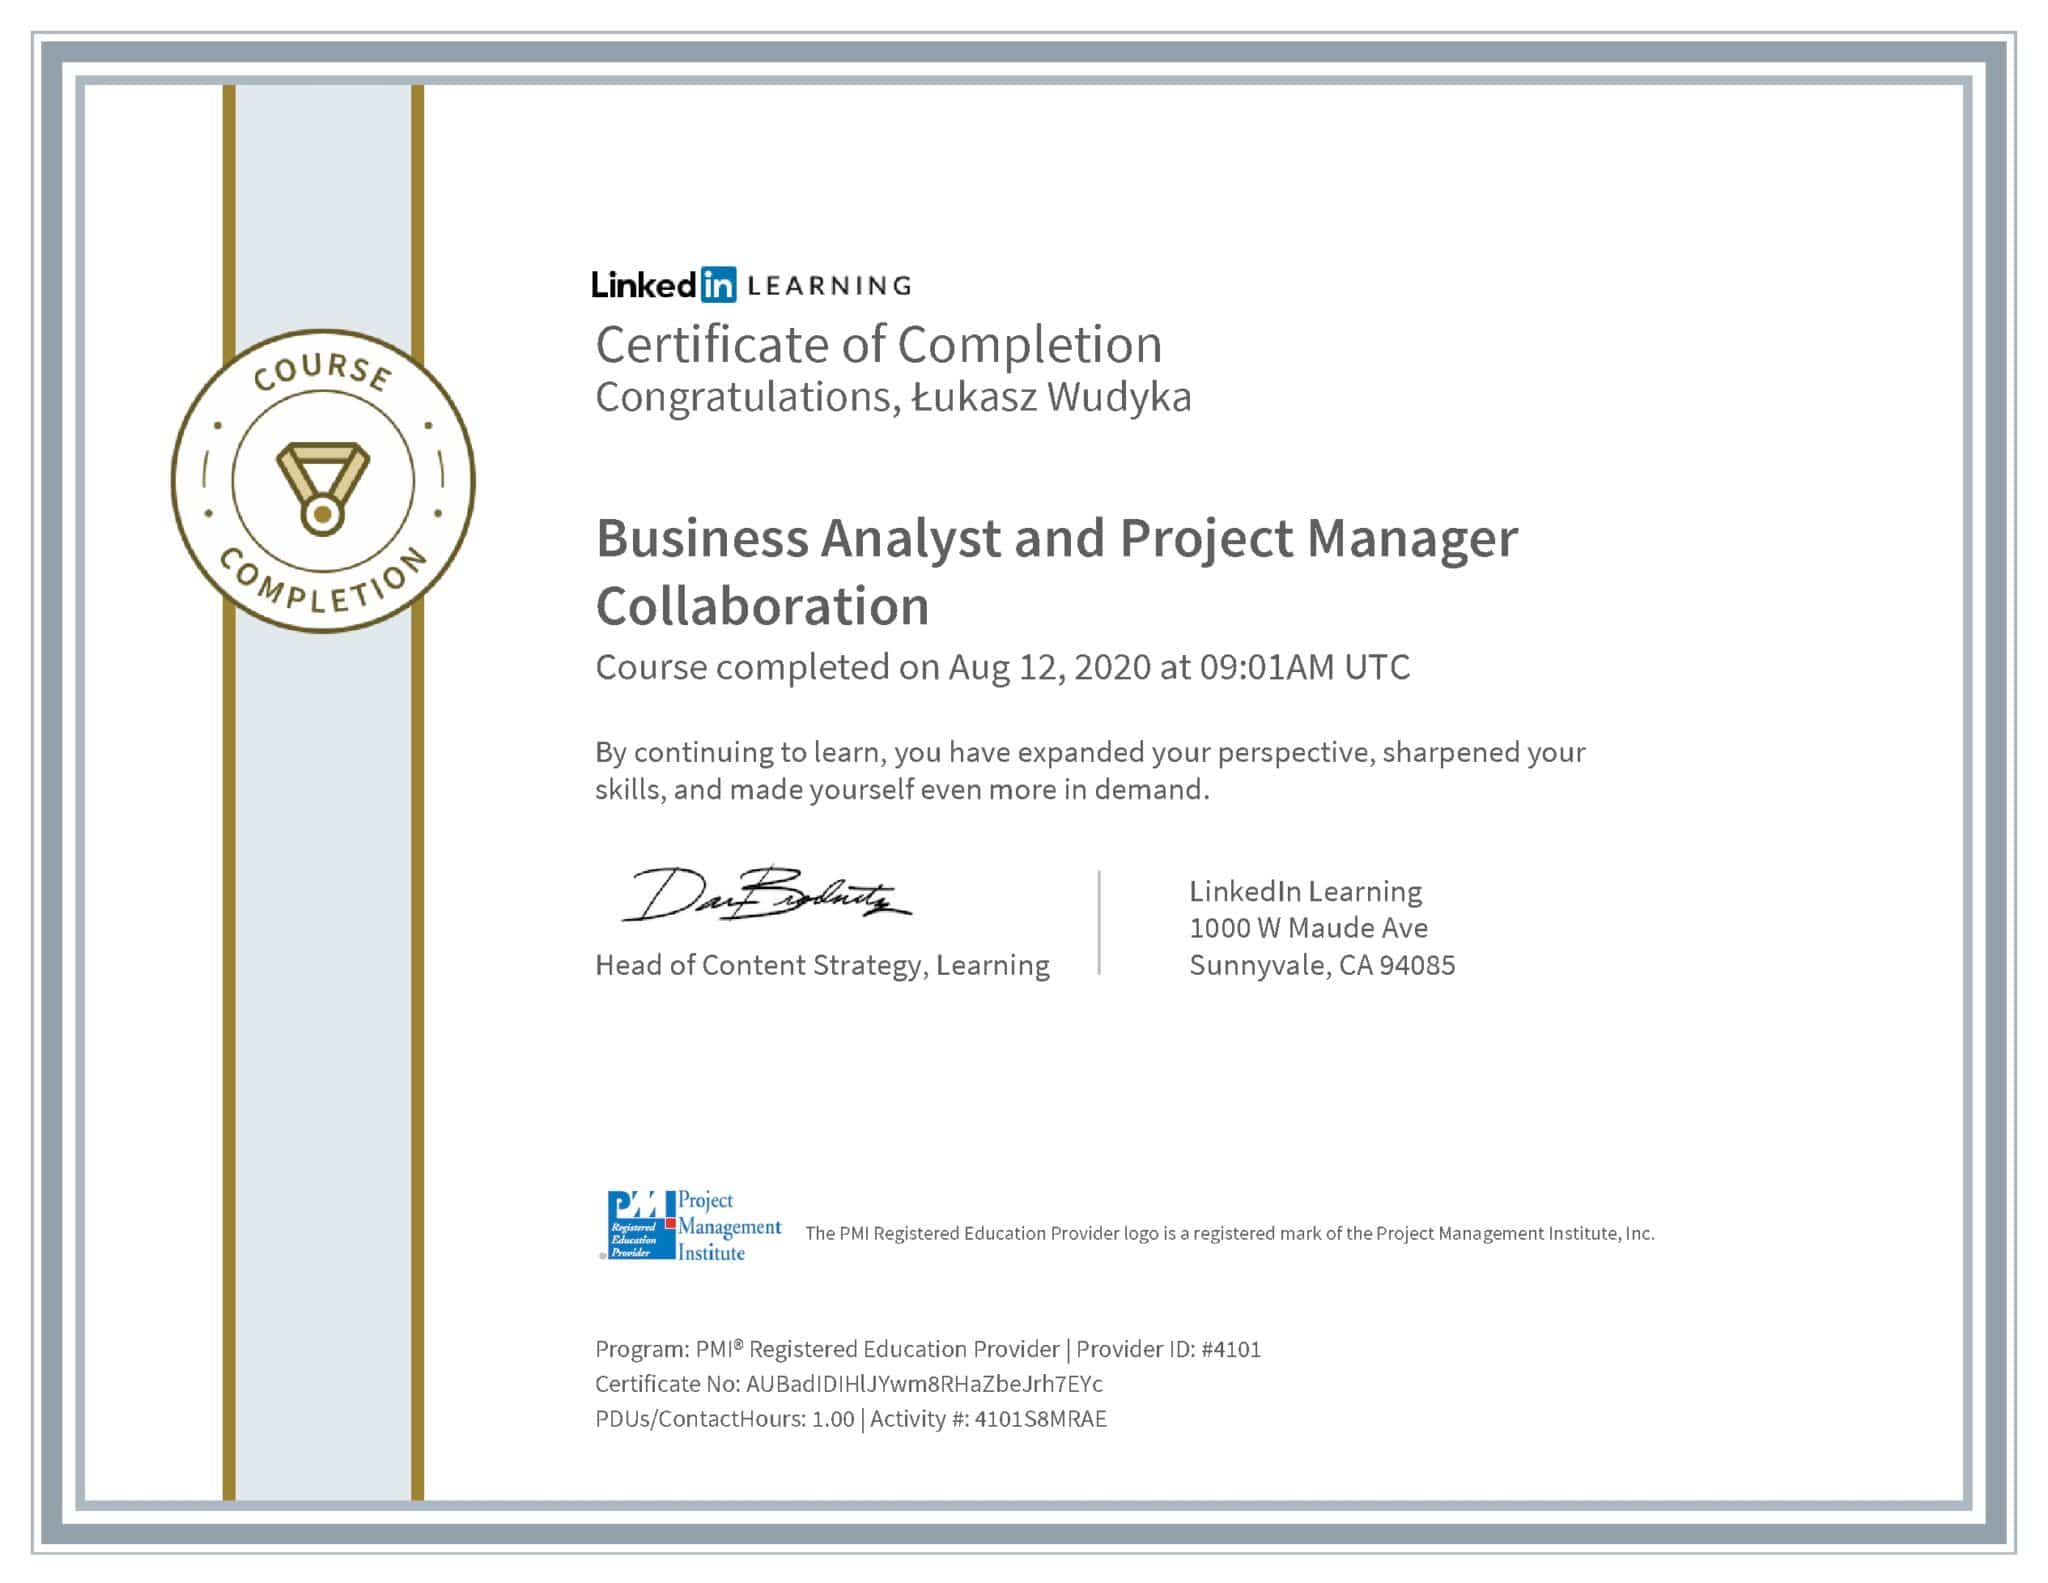 Łukasz Wudyka certyfikat LinkedIn Business Analyst and Project Manager Callaboration PMI